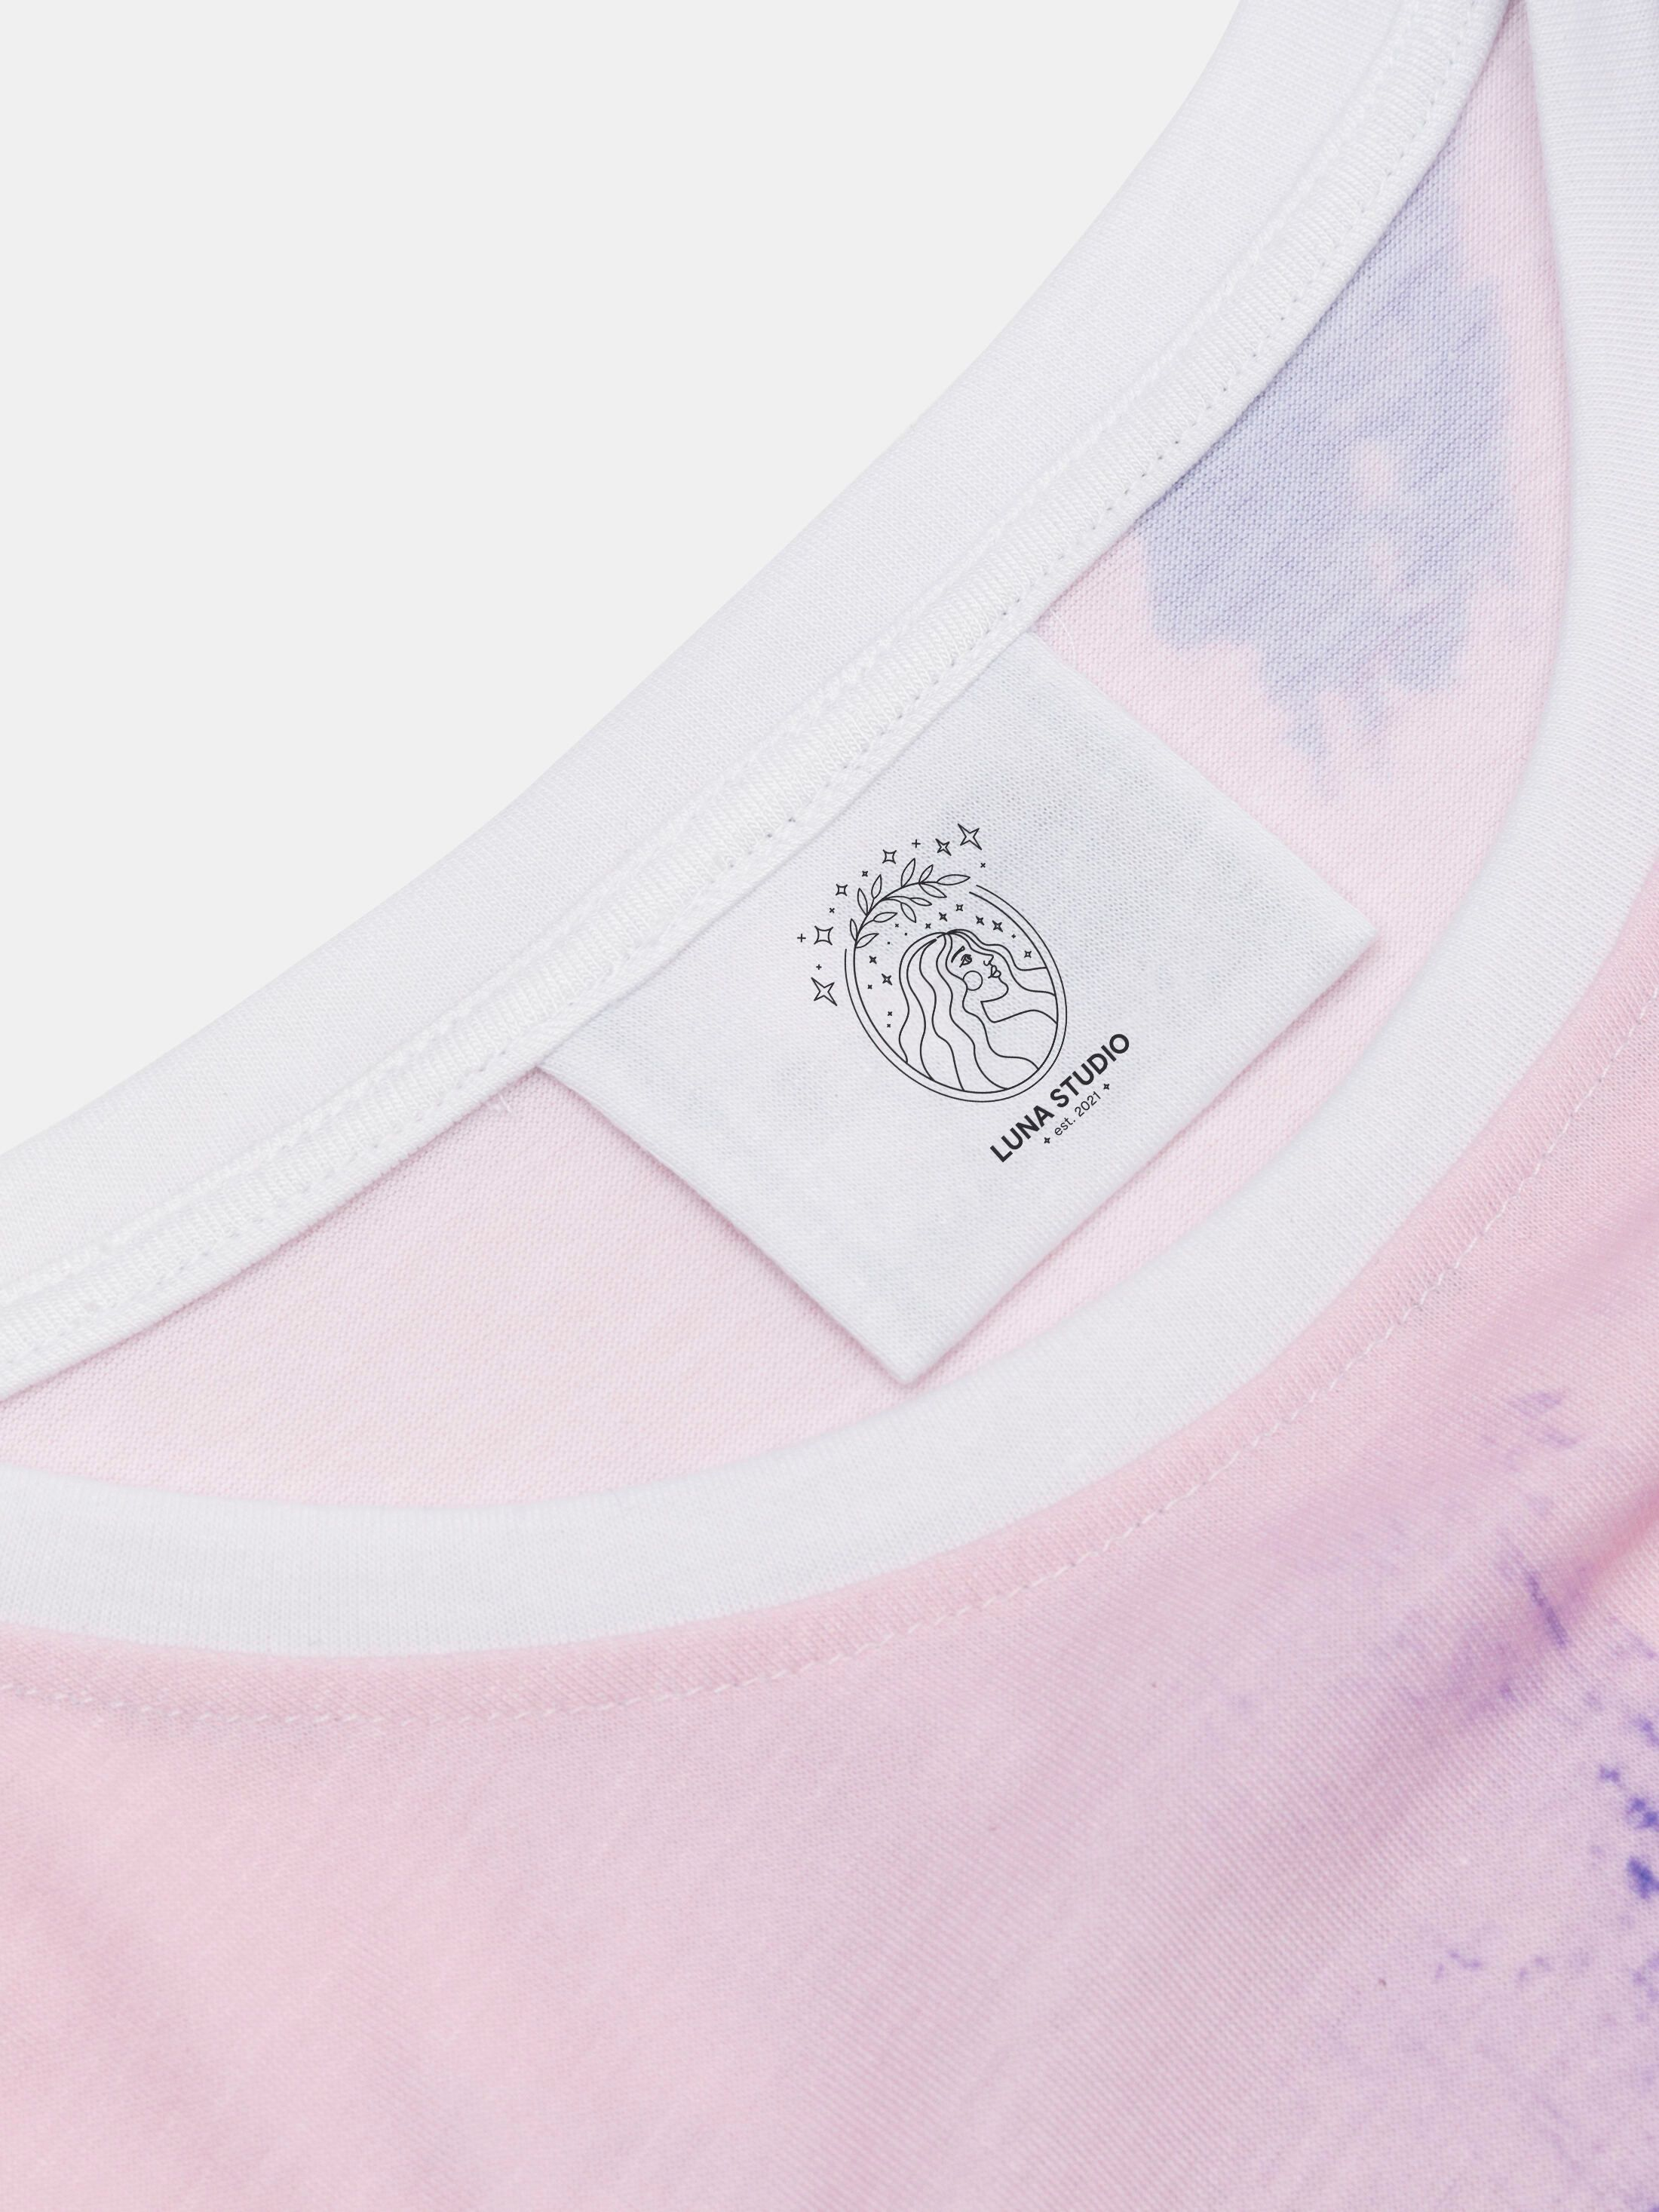 design your own vest top label design